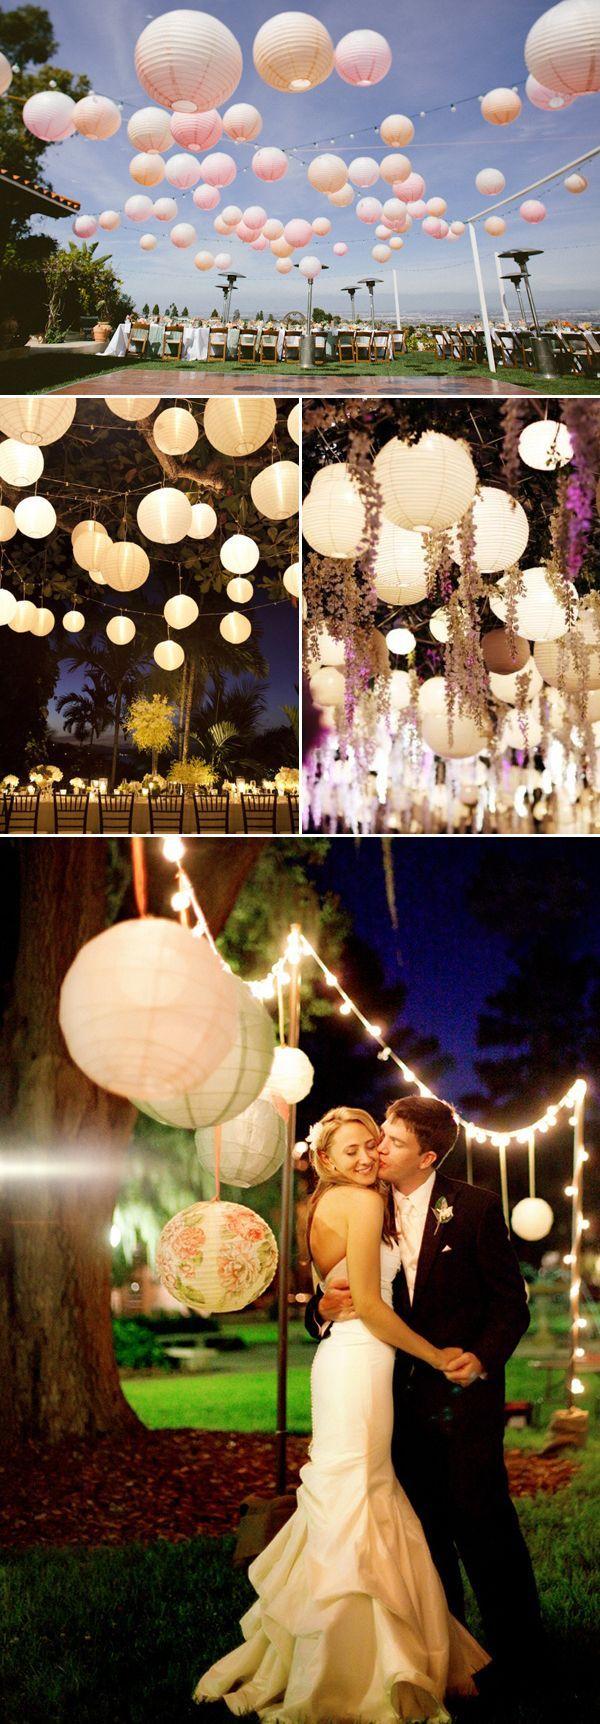 21 Lantern Wedding Decor Ideas - Night Scene